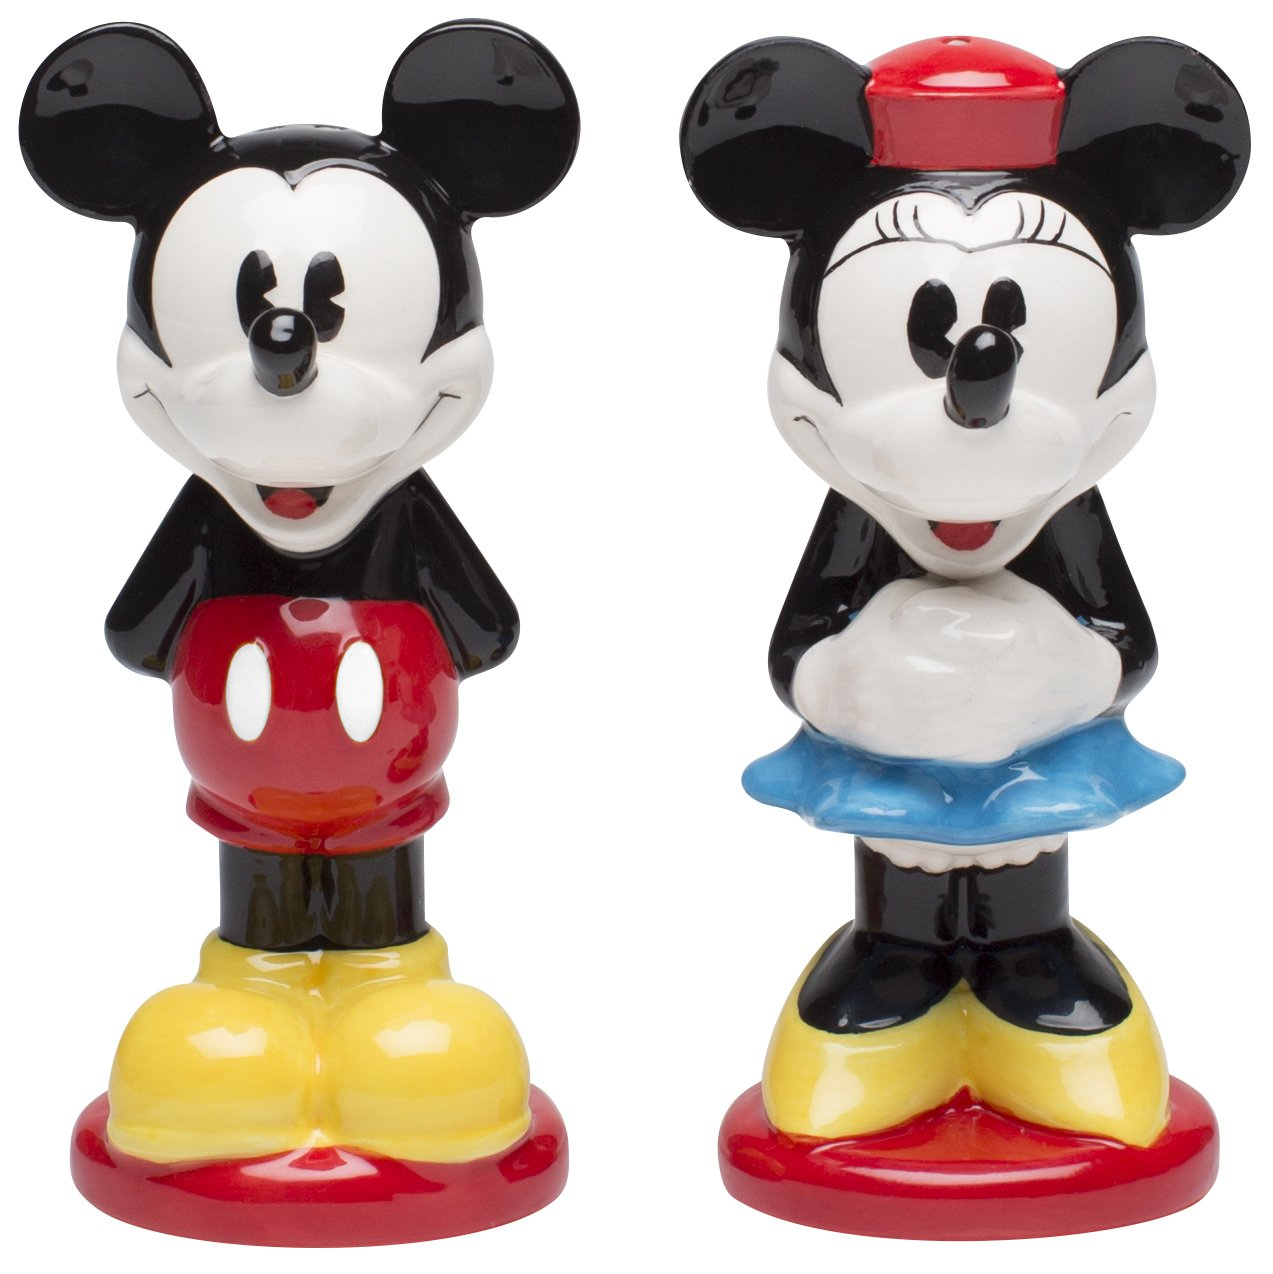 Zak Designs Mickey And Minnie Ceramic Salt & Pepper Shakers, Mickey and Minnie